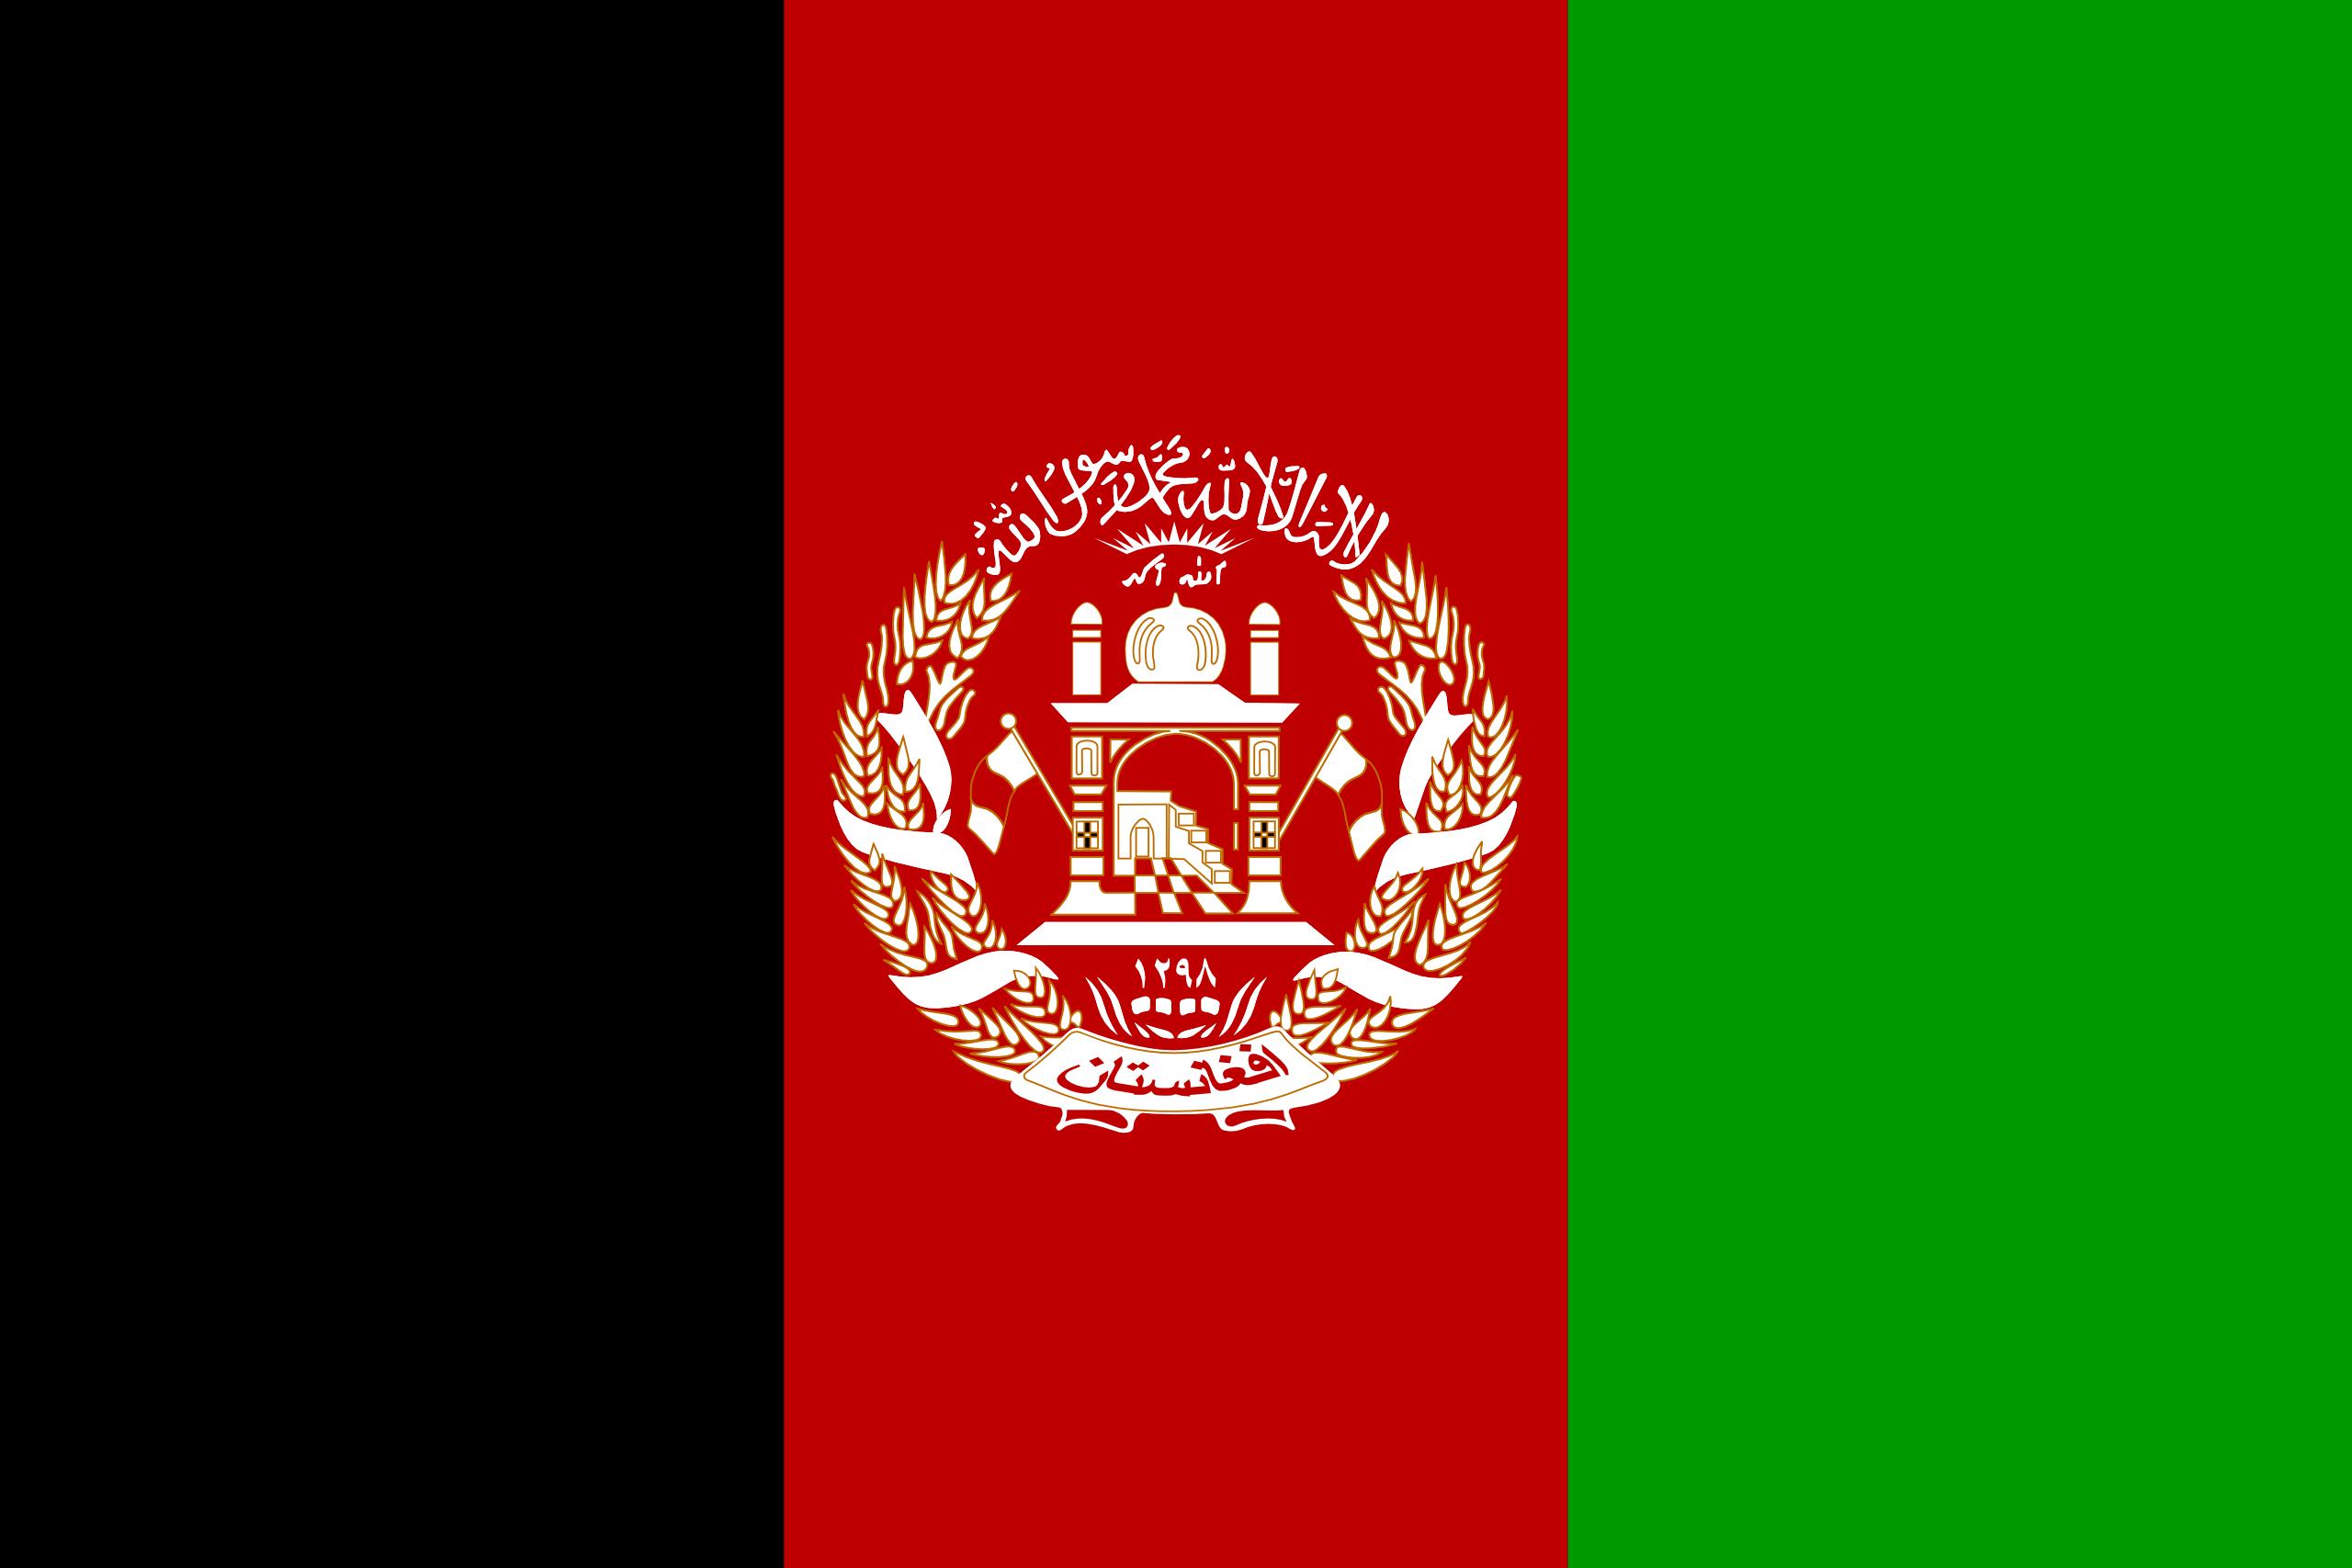 afganistan, 国家, 会徽, 徽标, 符号 - 高清壁纸 - 教授-falken.com